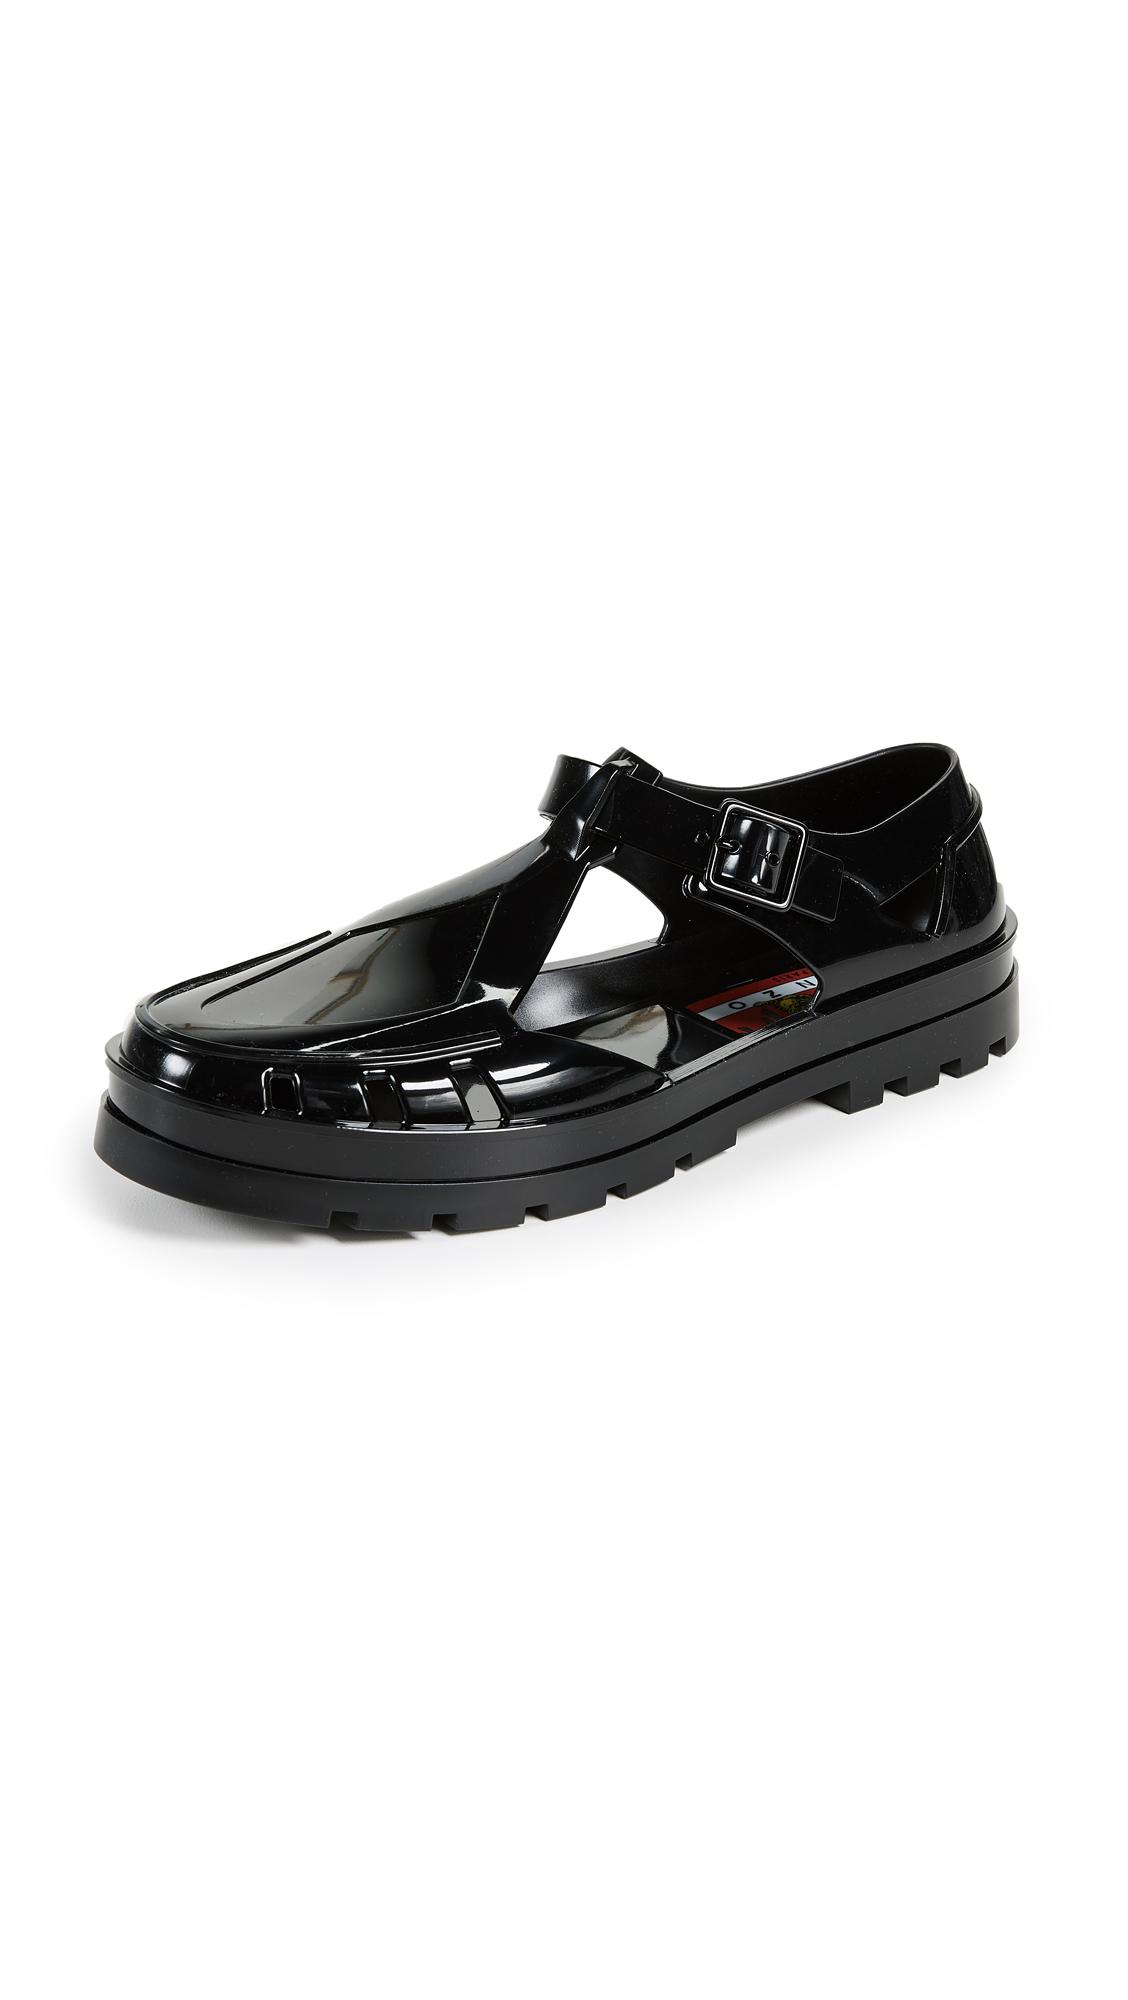 KENZO Sendia Jelly Sandals - Black